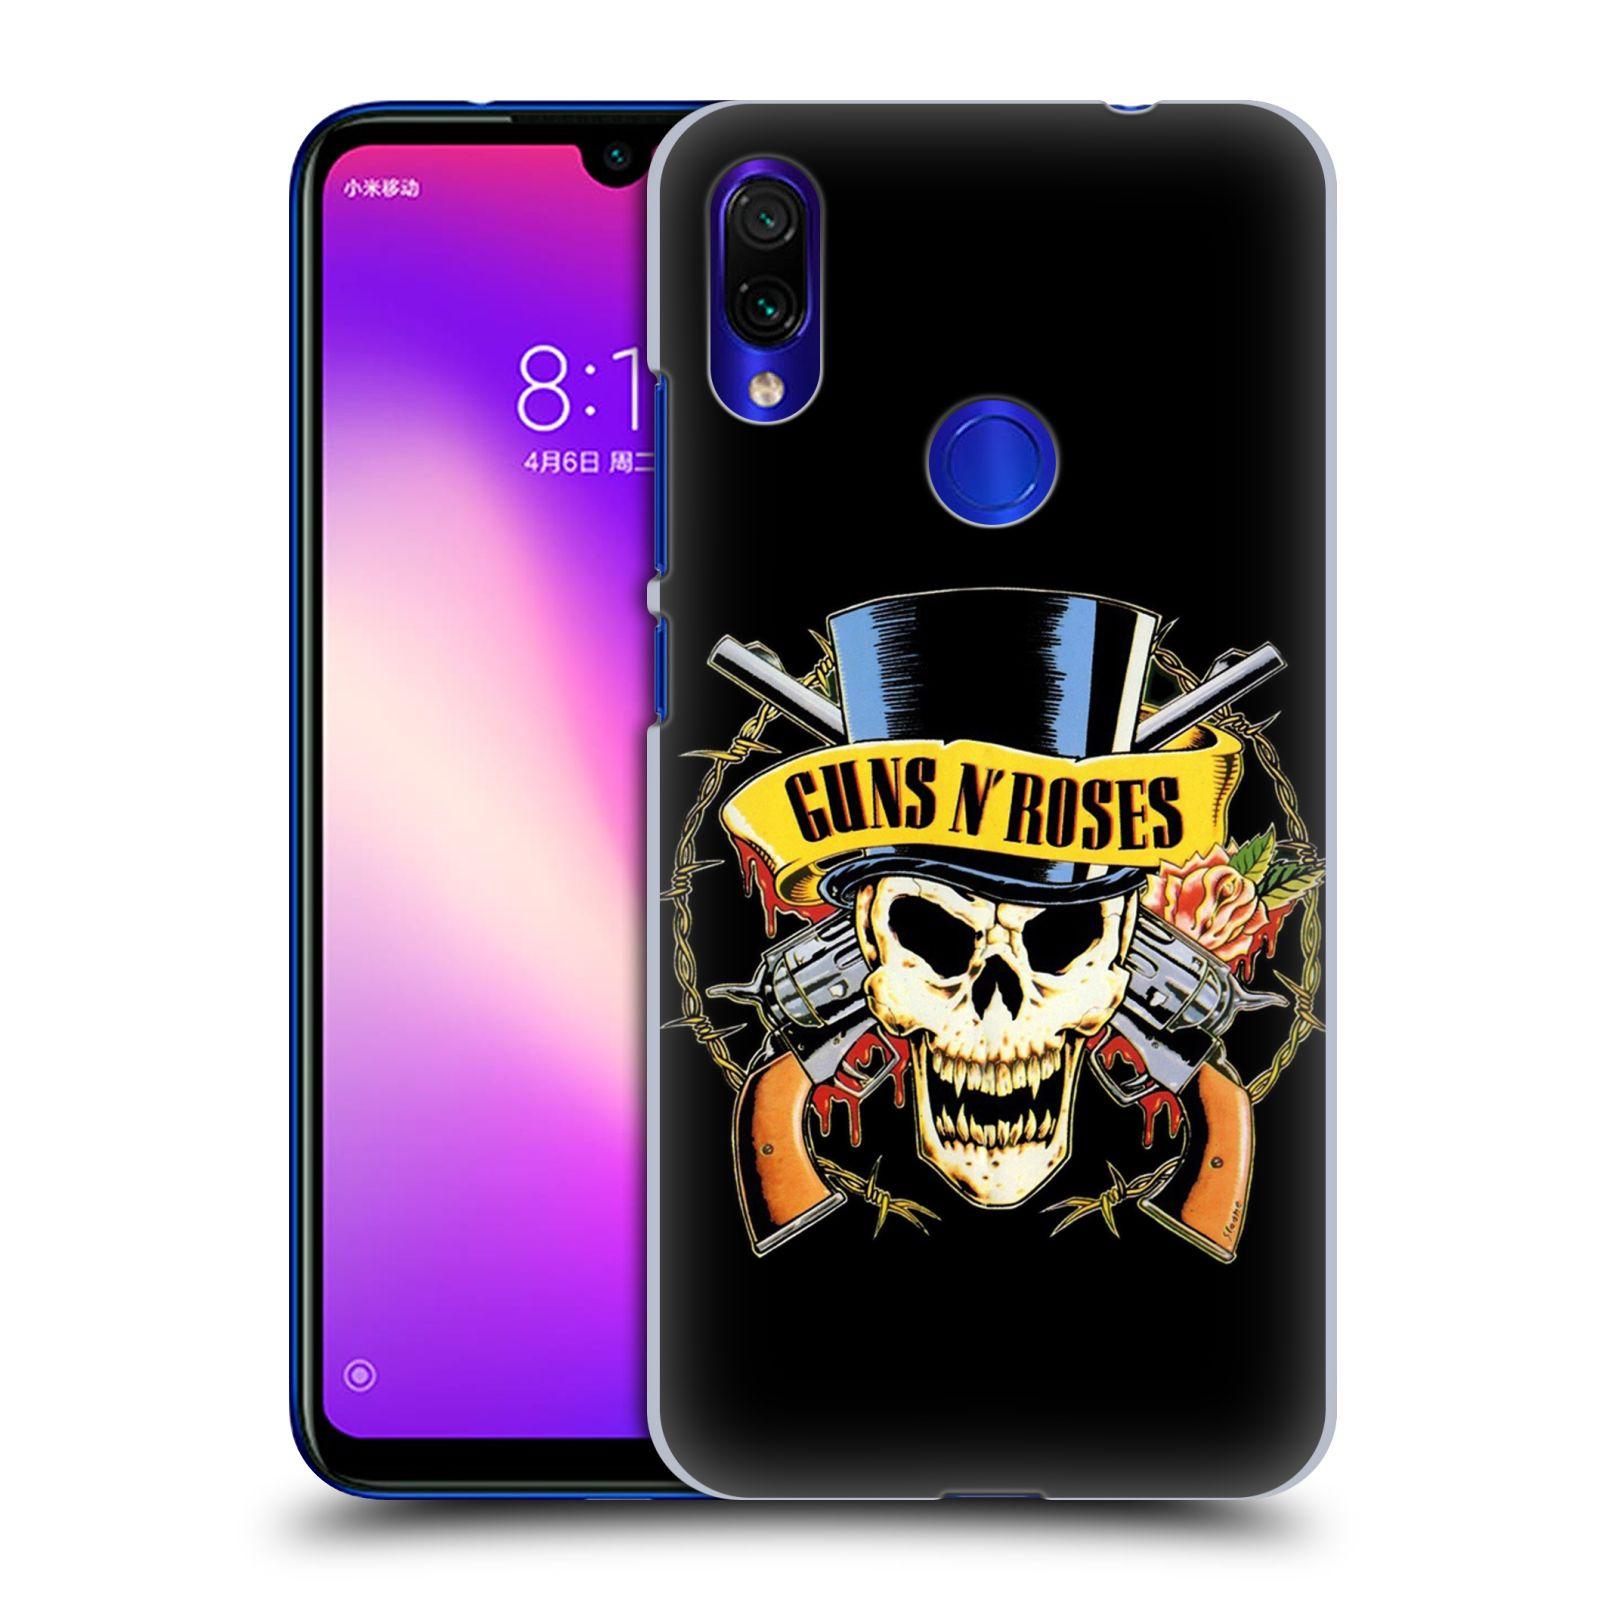 Plastové pouzdro na mobil Xiaomi Redmi Note 7 - Head Case - Guns N' Roses - Lebka